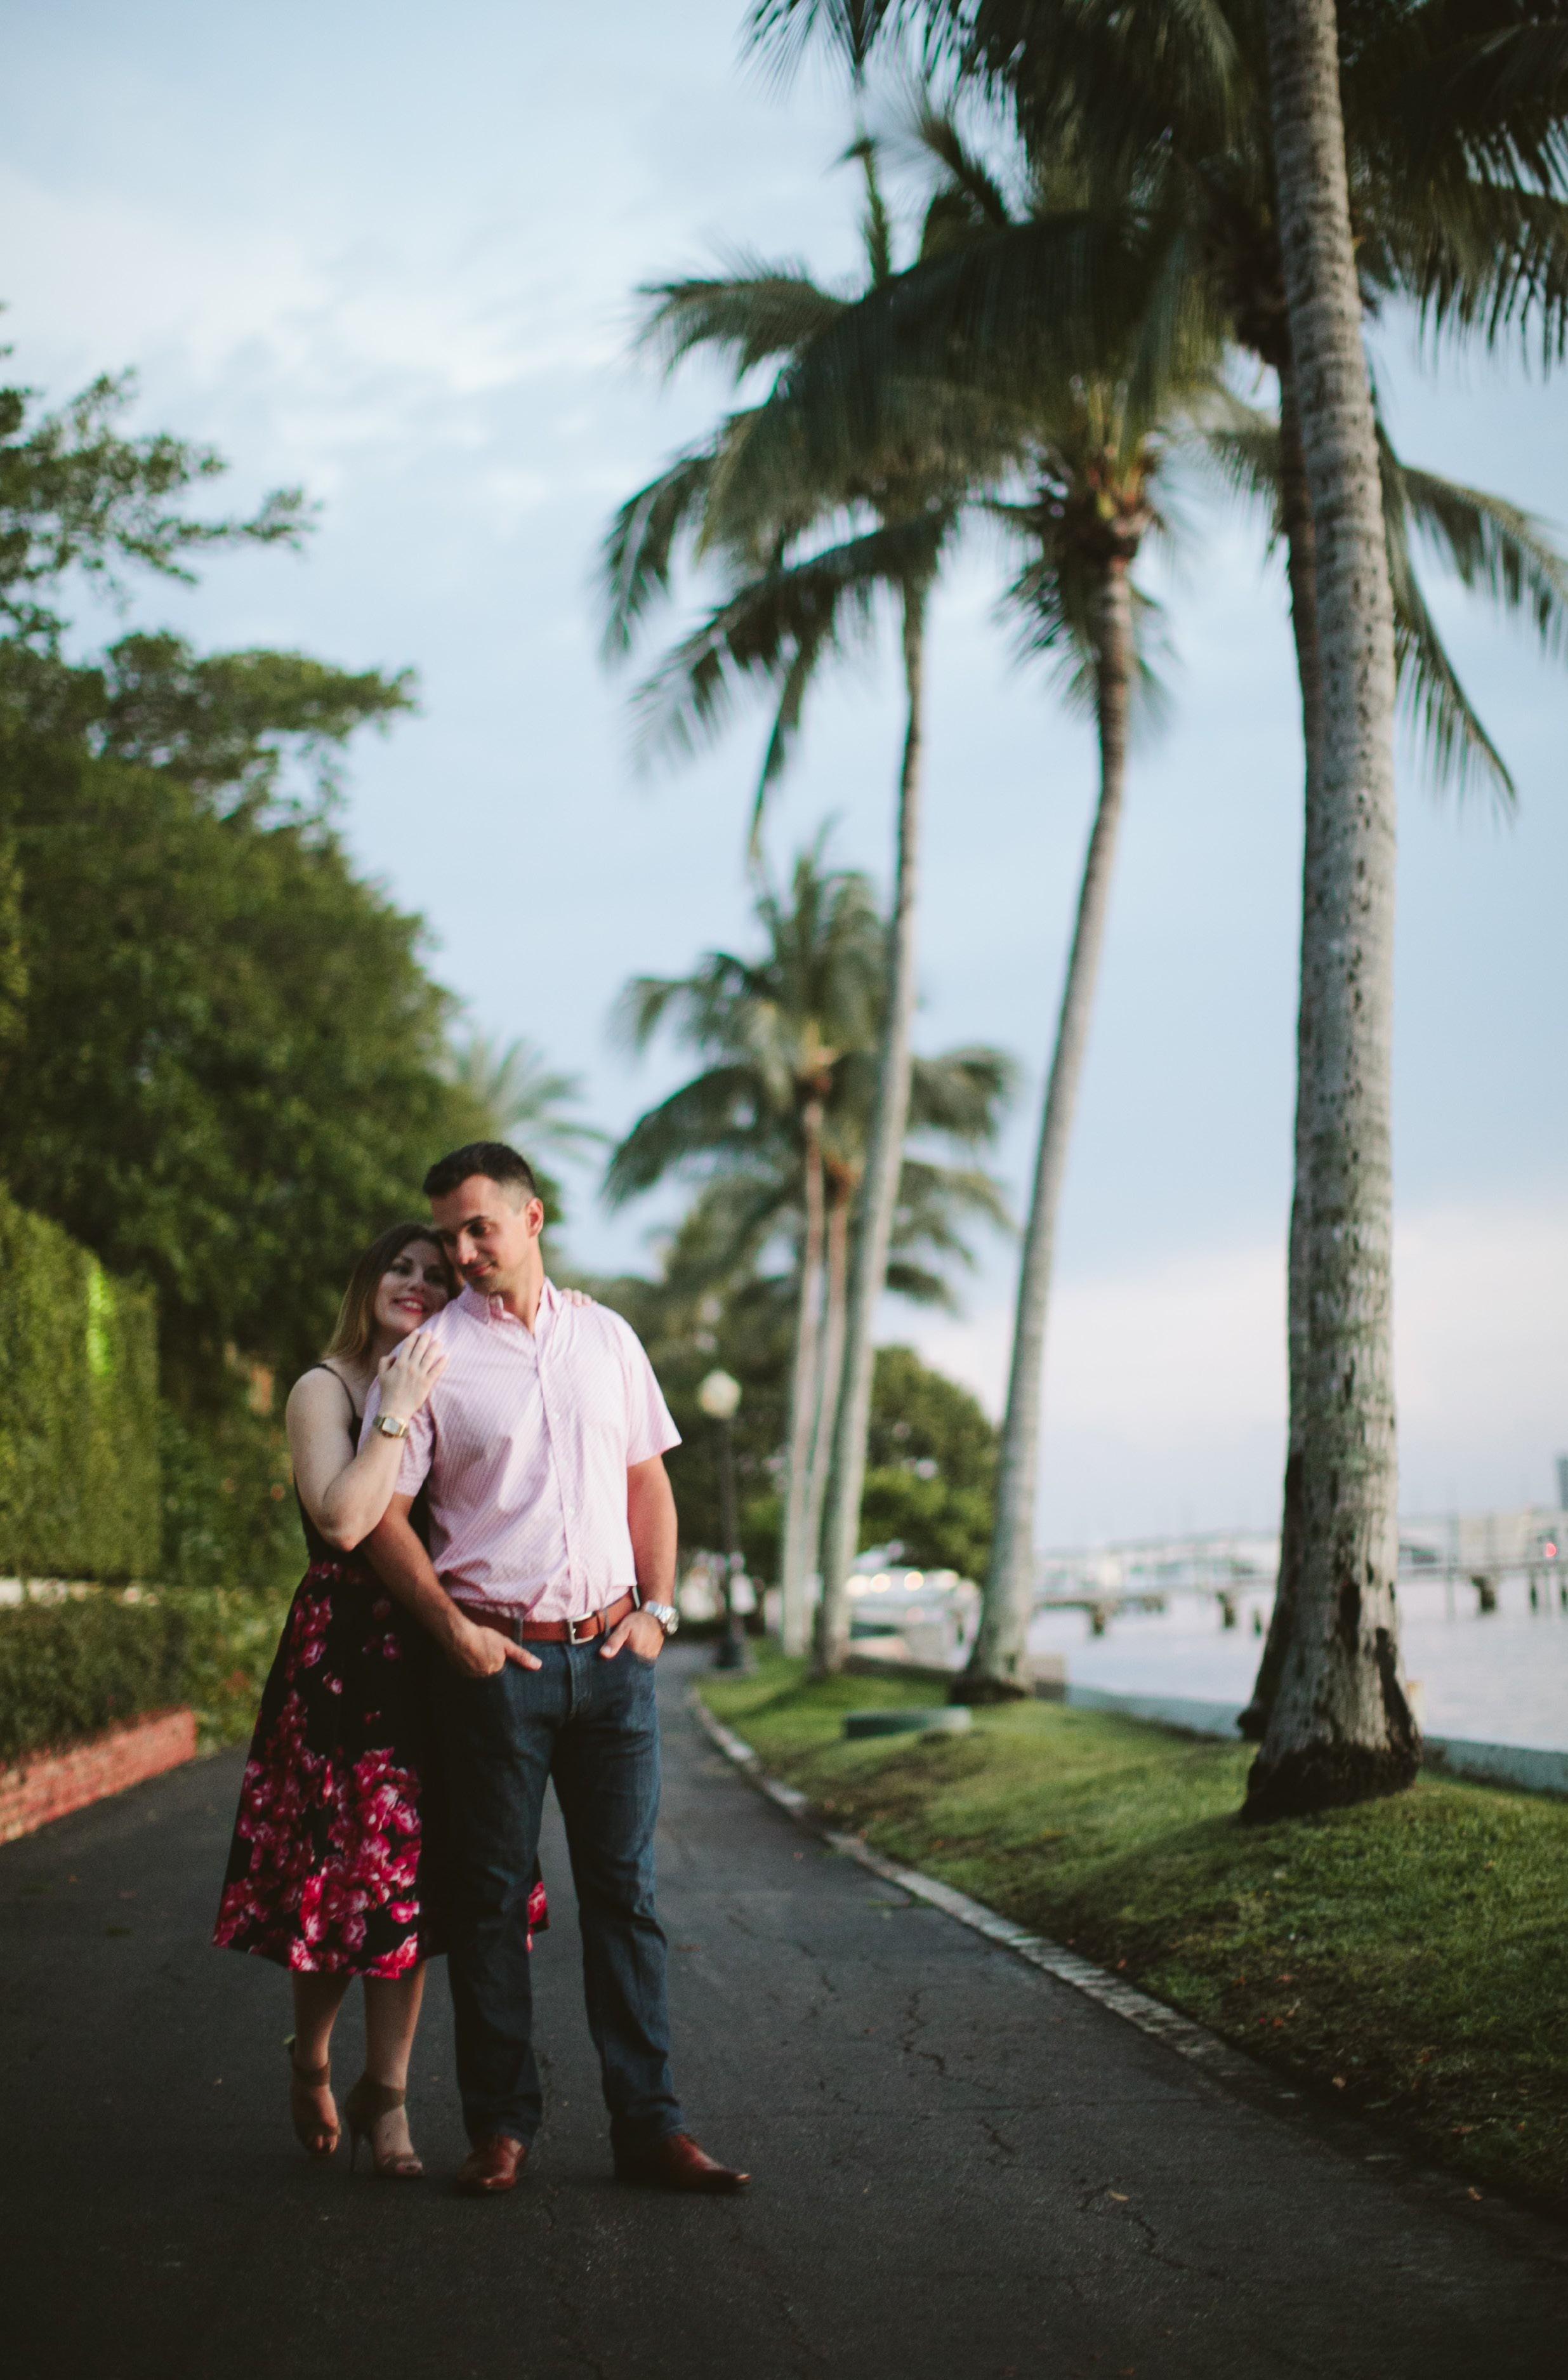 Ida + Danny Surprise Proposal Engagement Shoot at Flagler Museum Palm Beach14.jpg